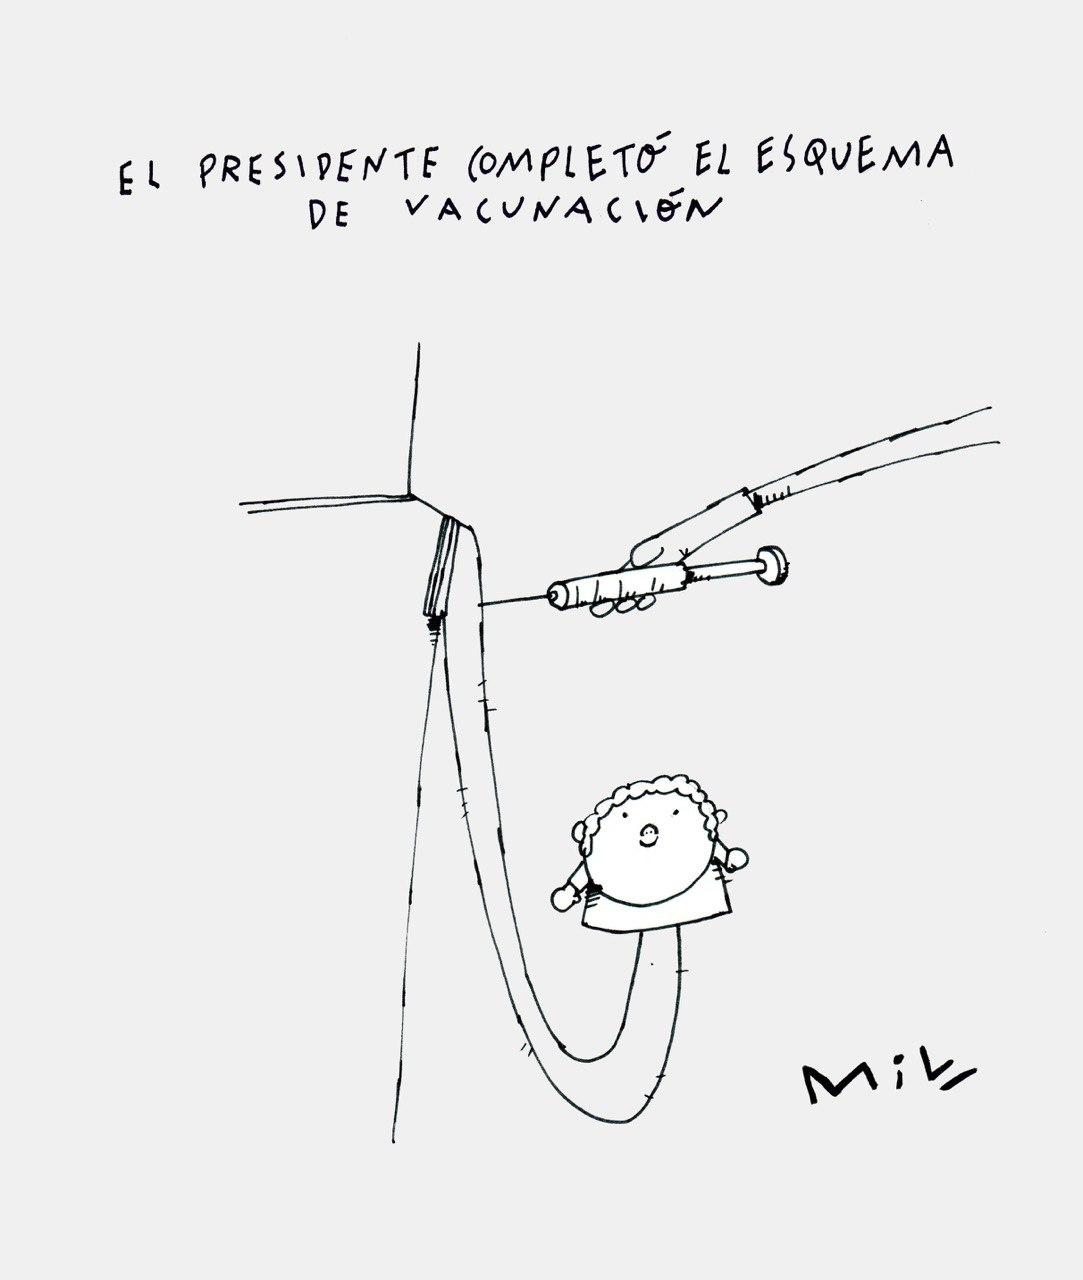 Presidente completó esquema de vacunación - #Caricatura7días 1